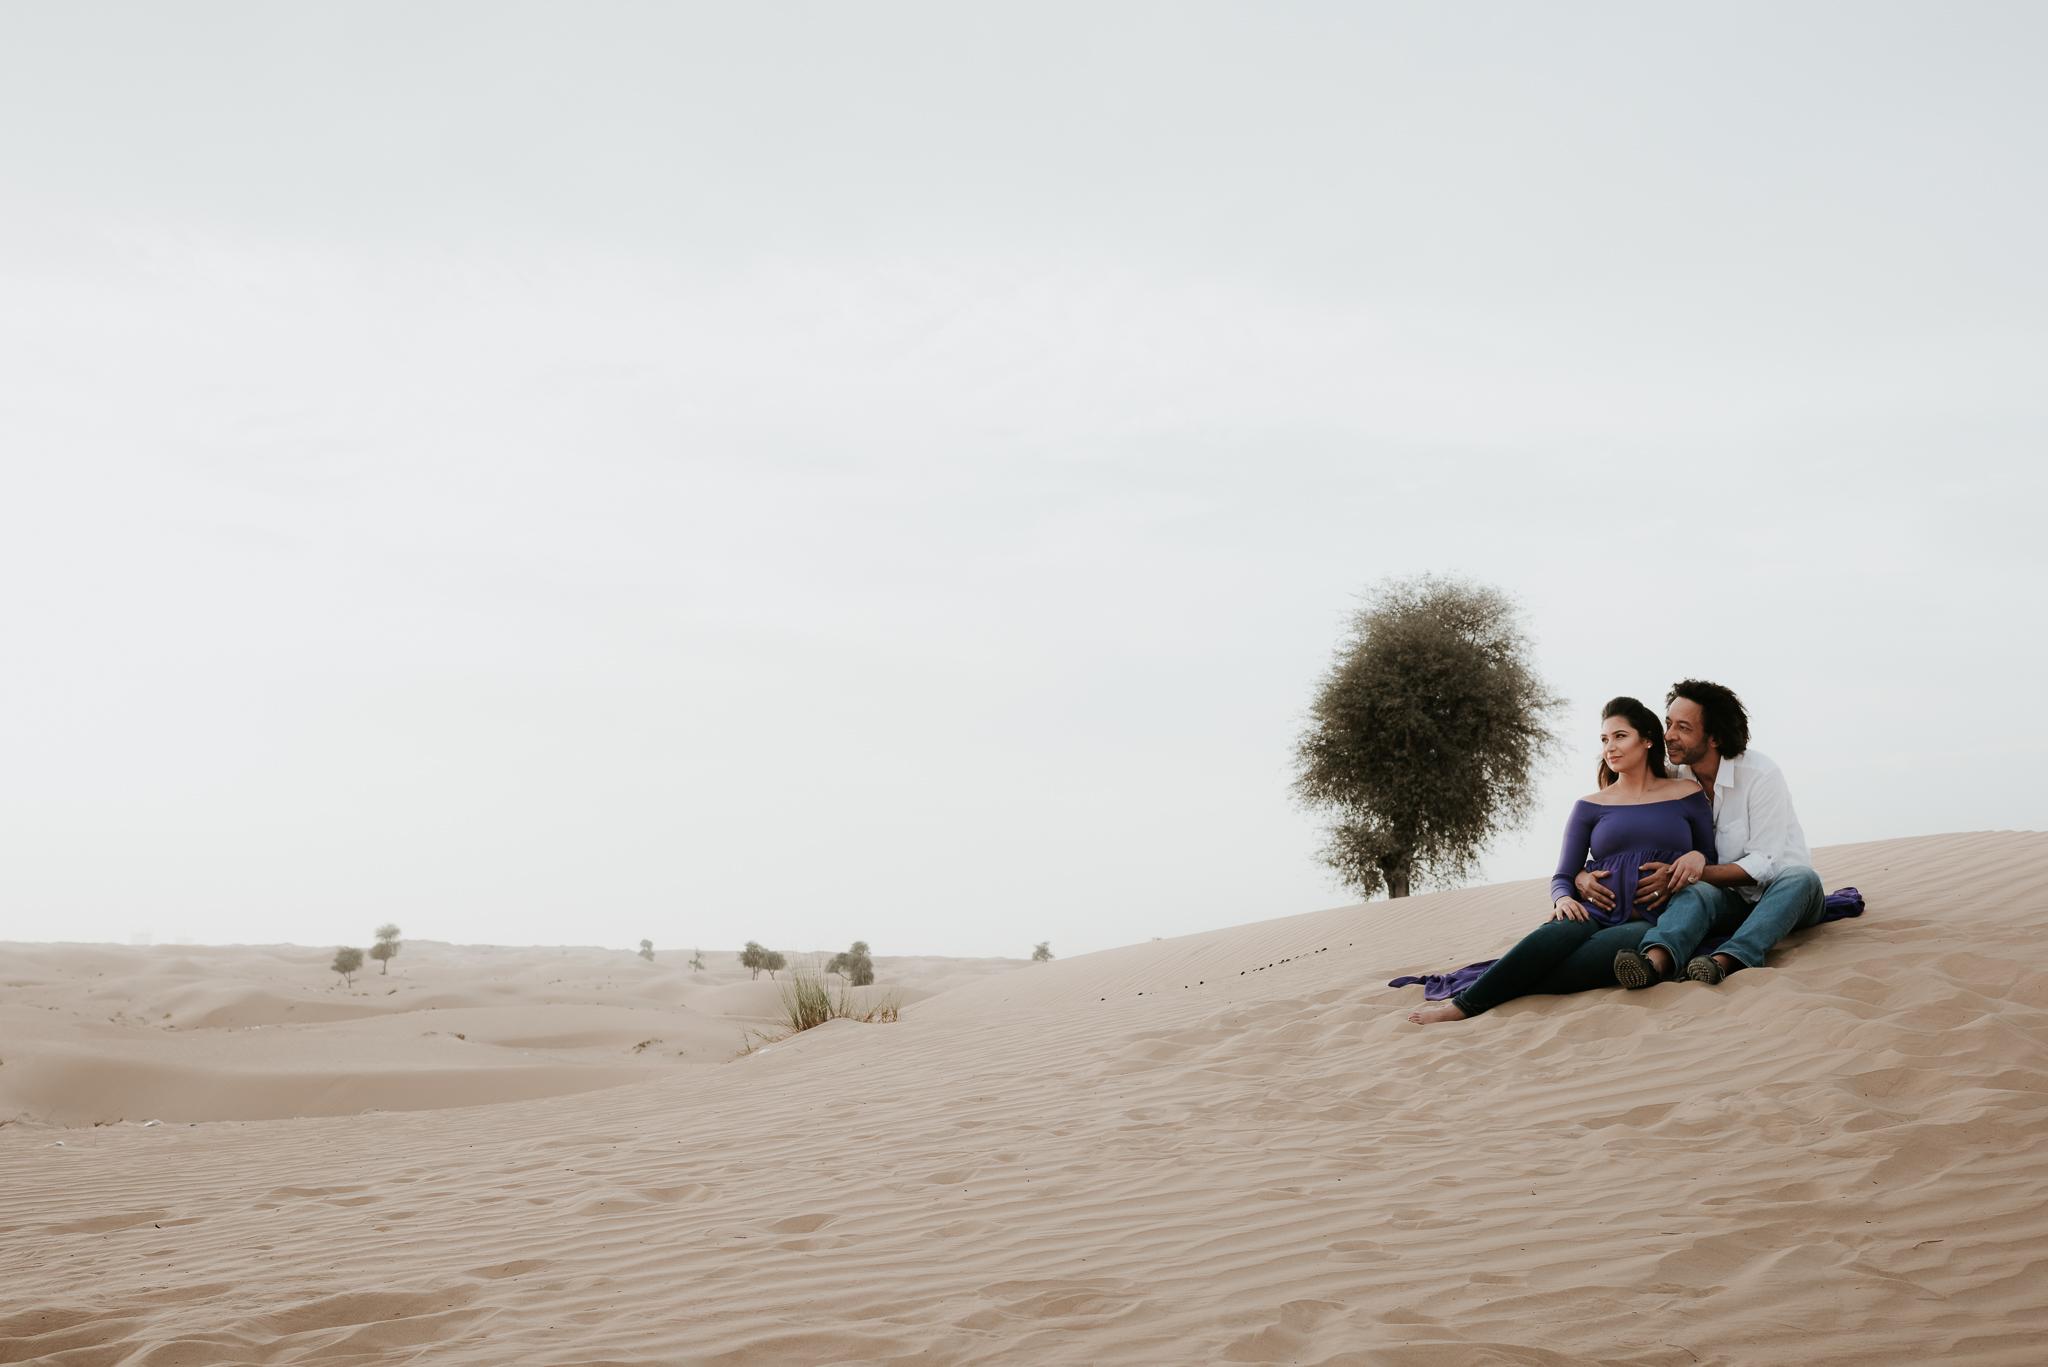 Lana-Photographs-Dubai-Maternity-Photographer-FatimaE-PSLR-11.jpg